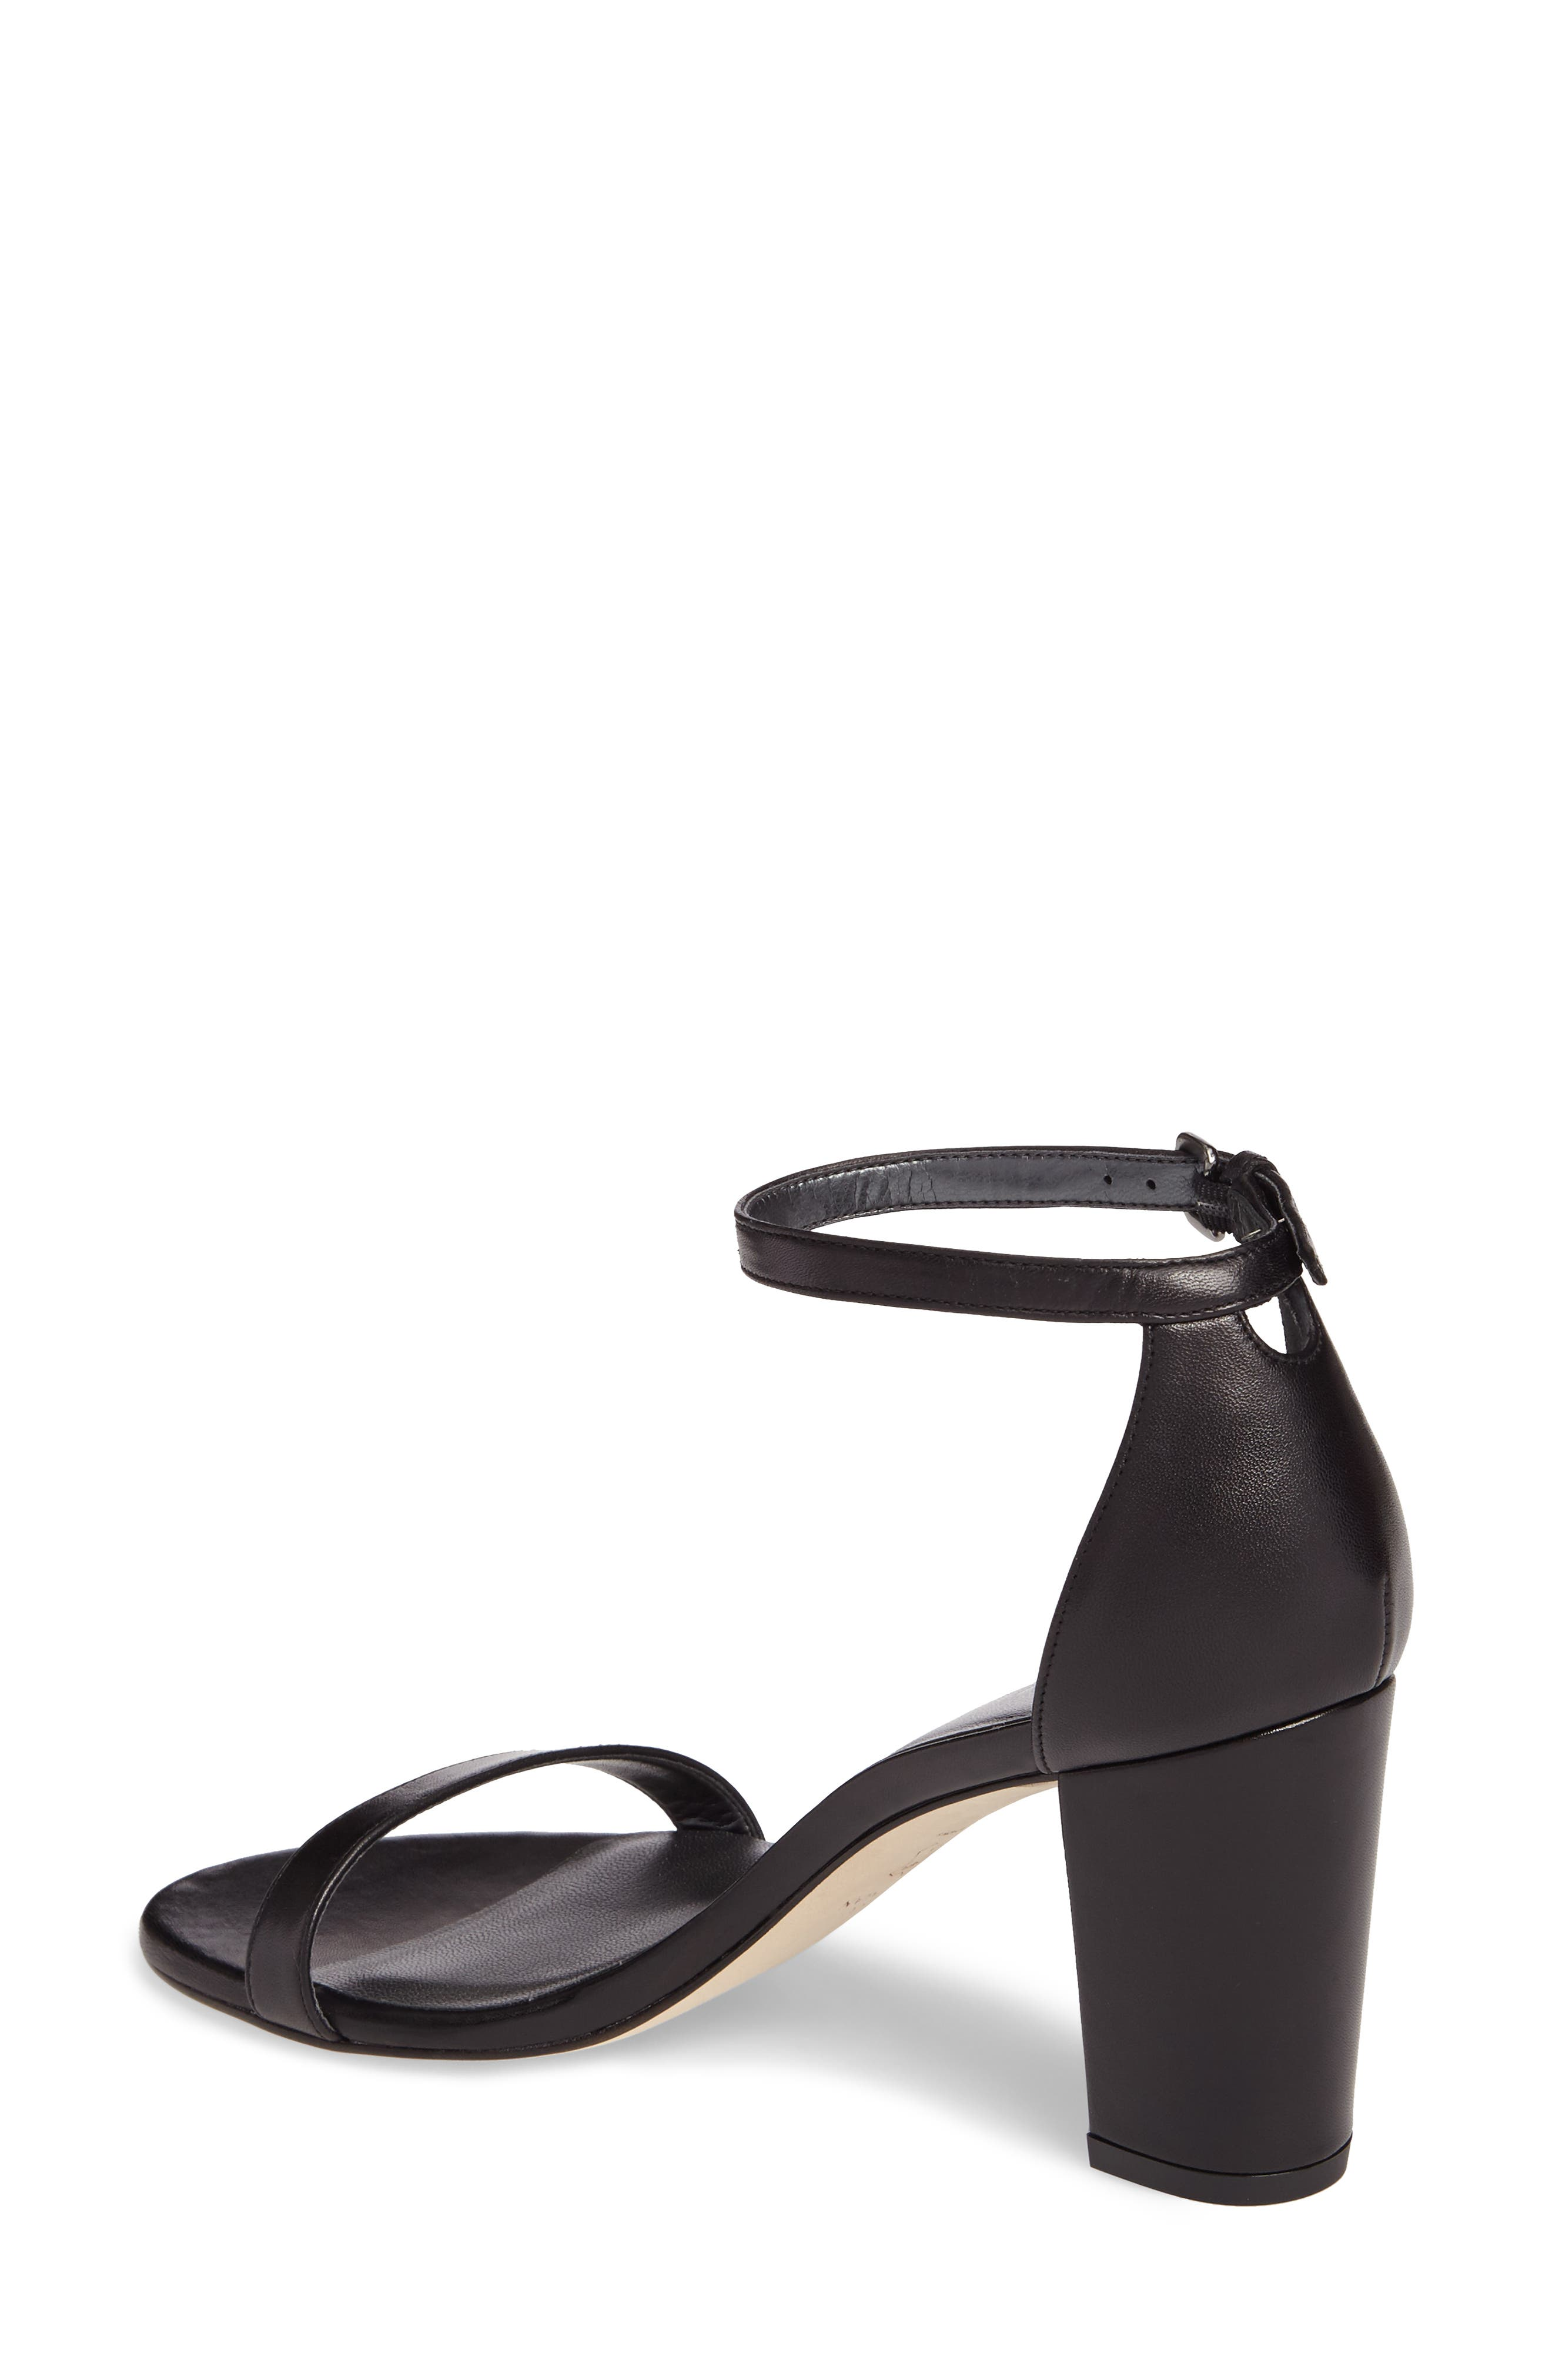 NearlyNude Ankle Strap Sandal,                             Alternate thumbnail 5, color,                             Black Nappa